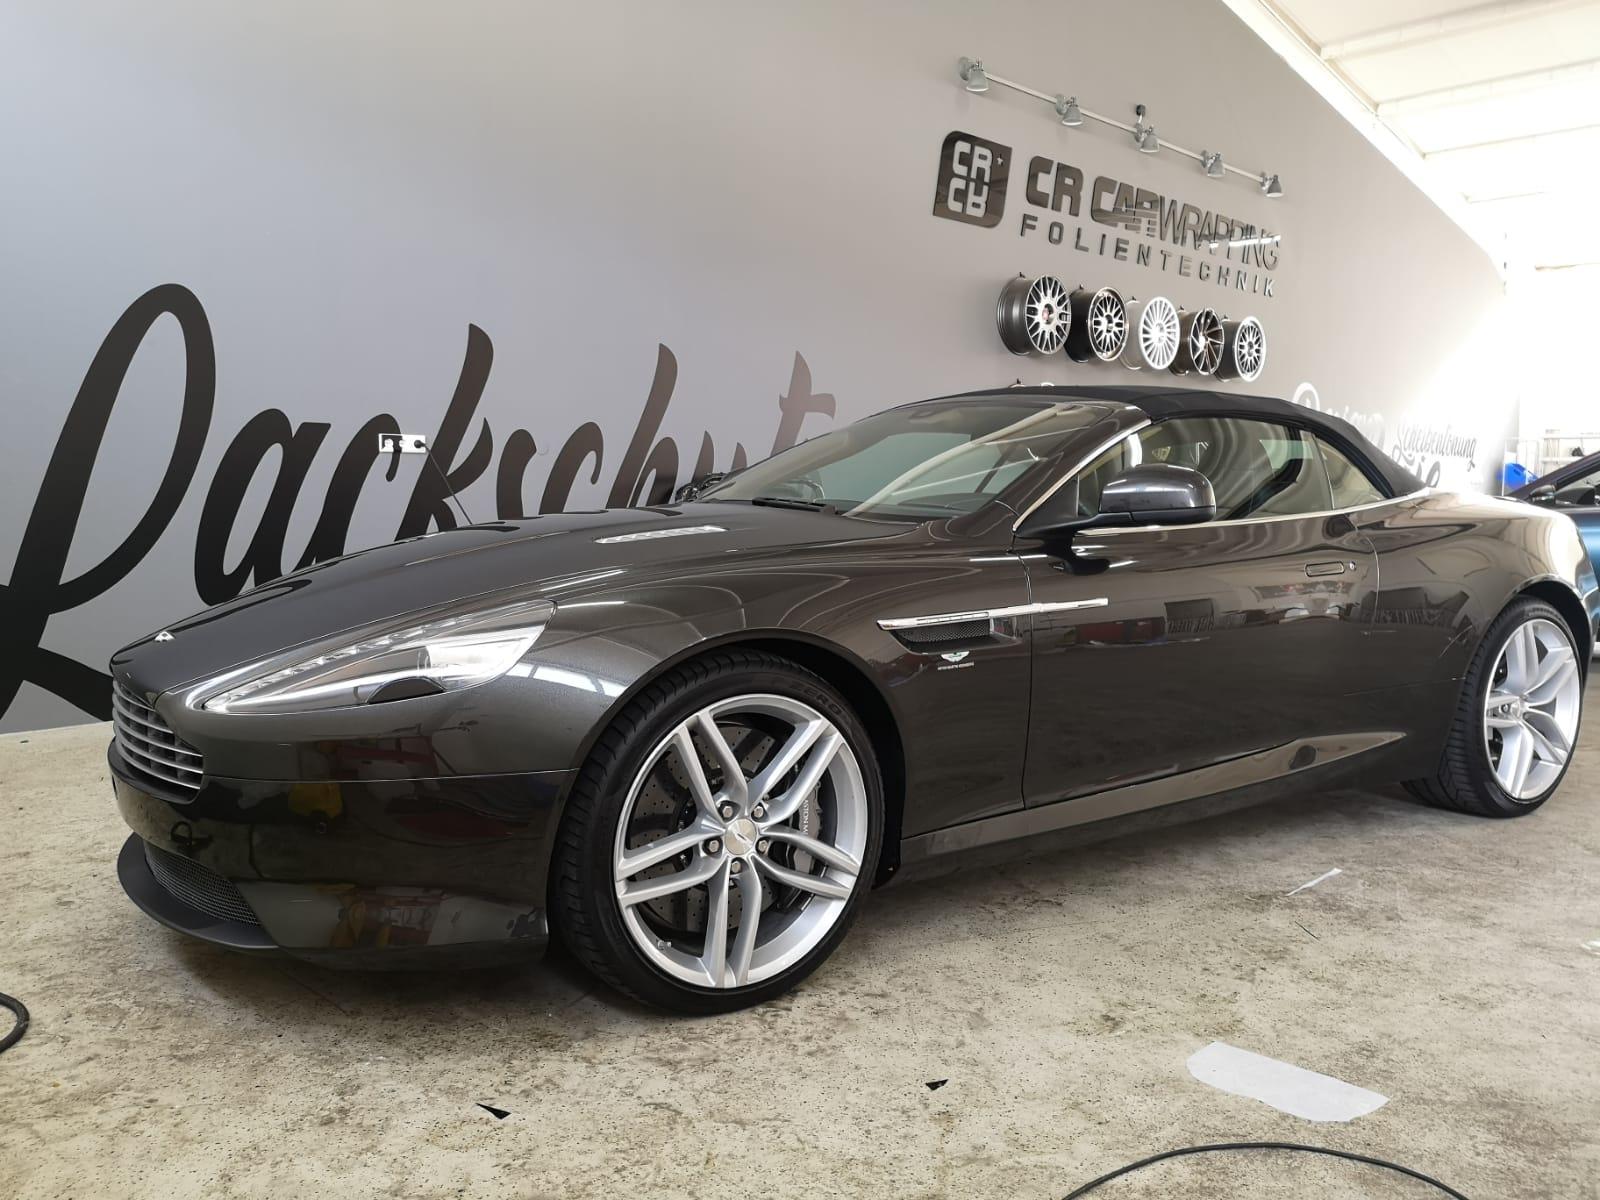 Aston Martin Lackschutz Würzburg